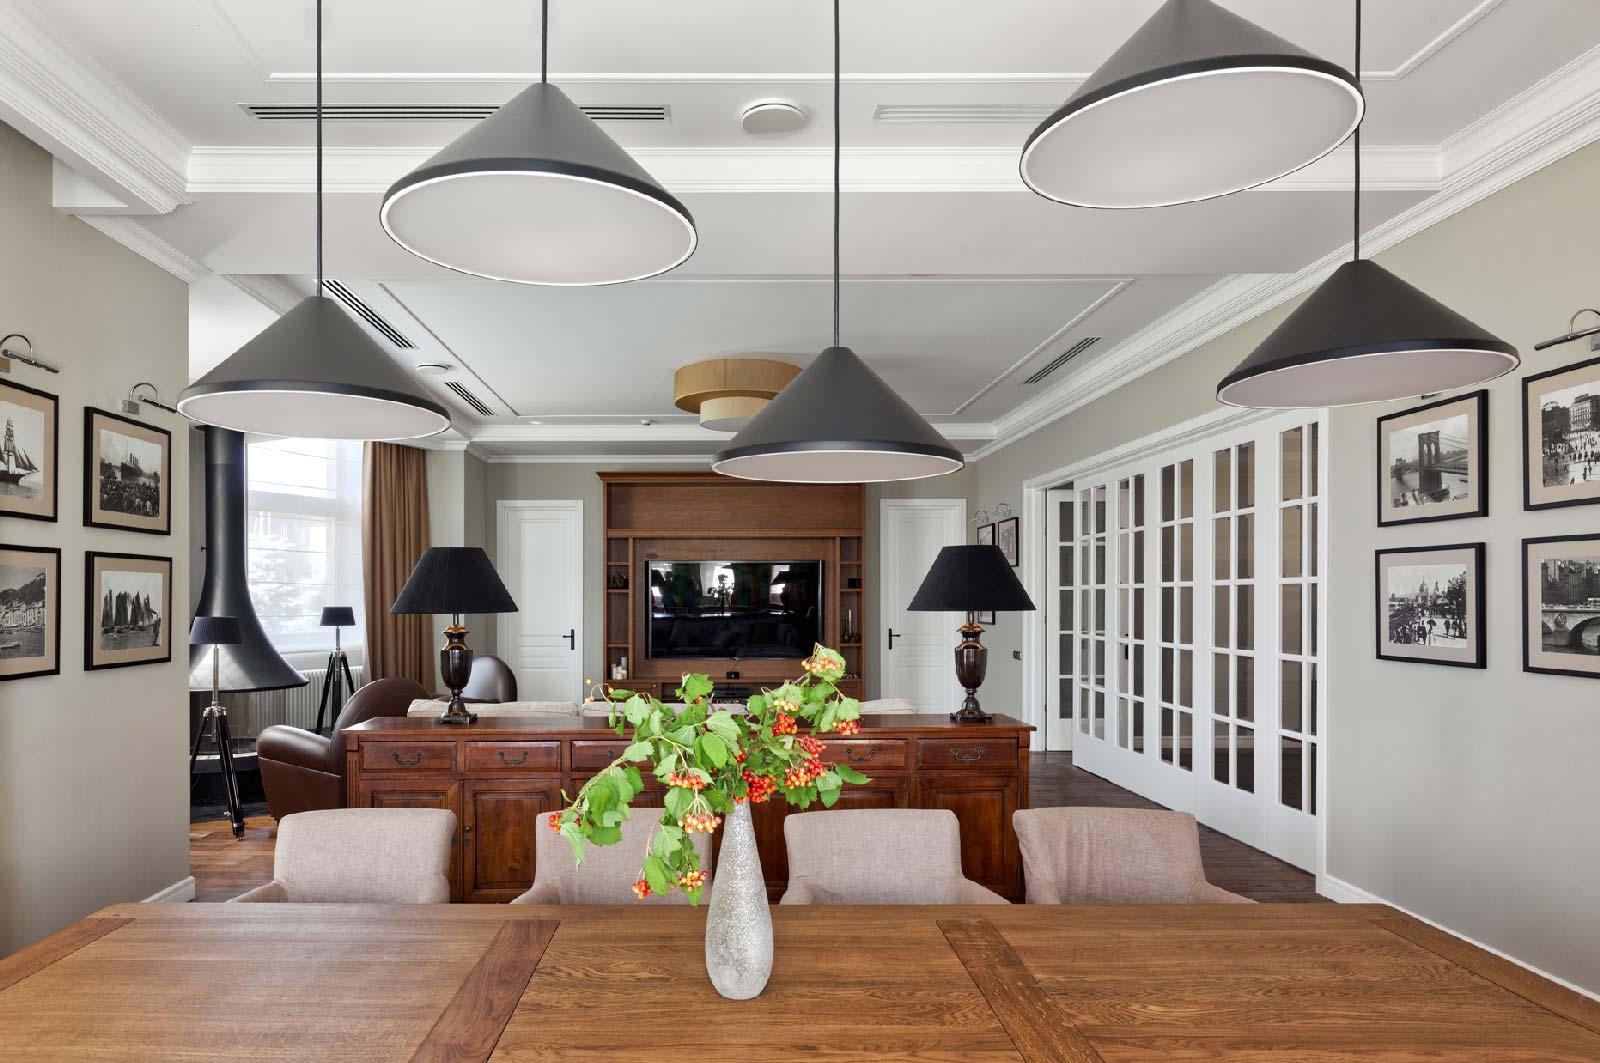 Porte In Stile Inglese Per Una Casa New Classic Garofoli